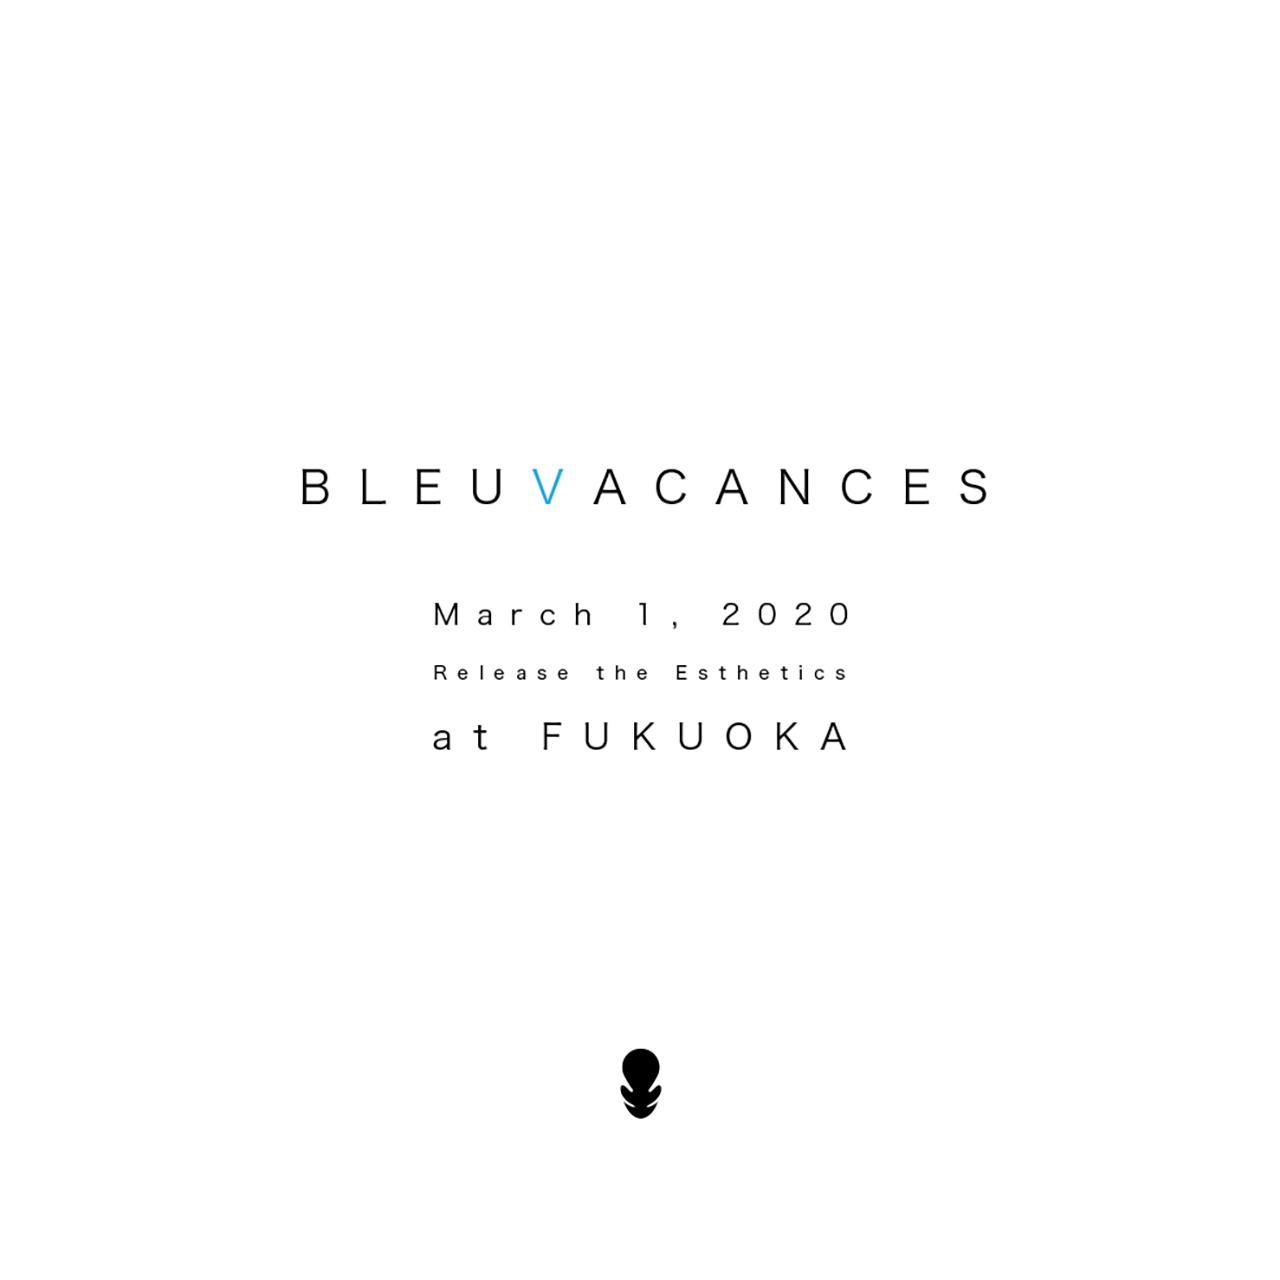 BLEUVACANCES-1